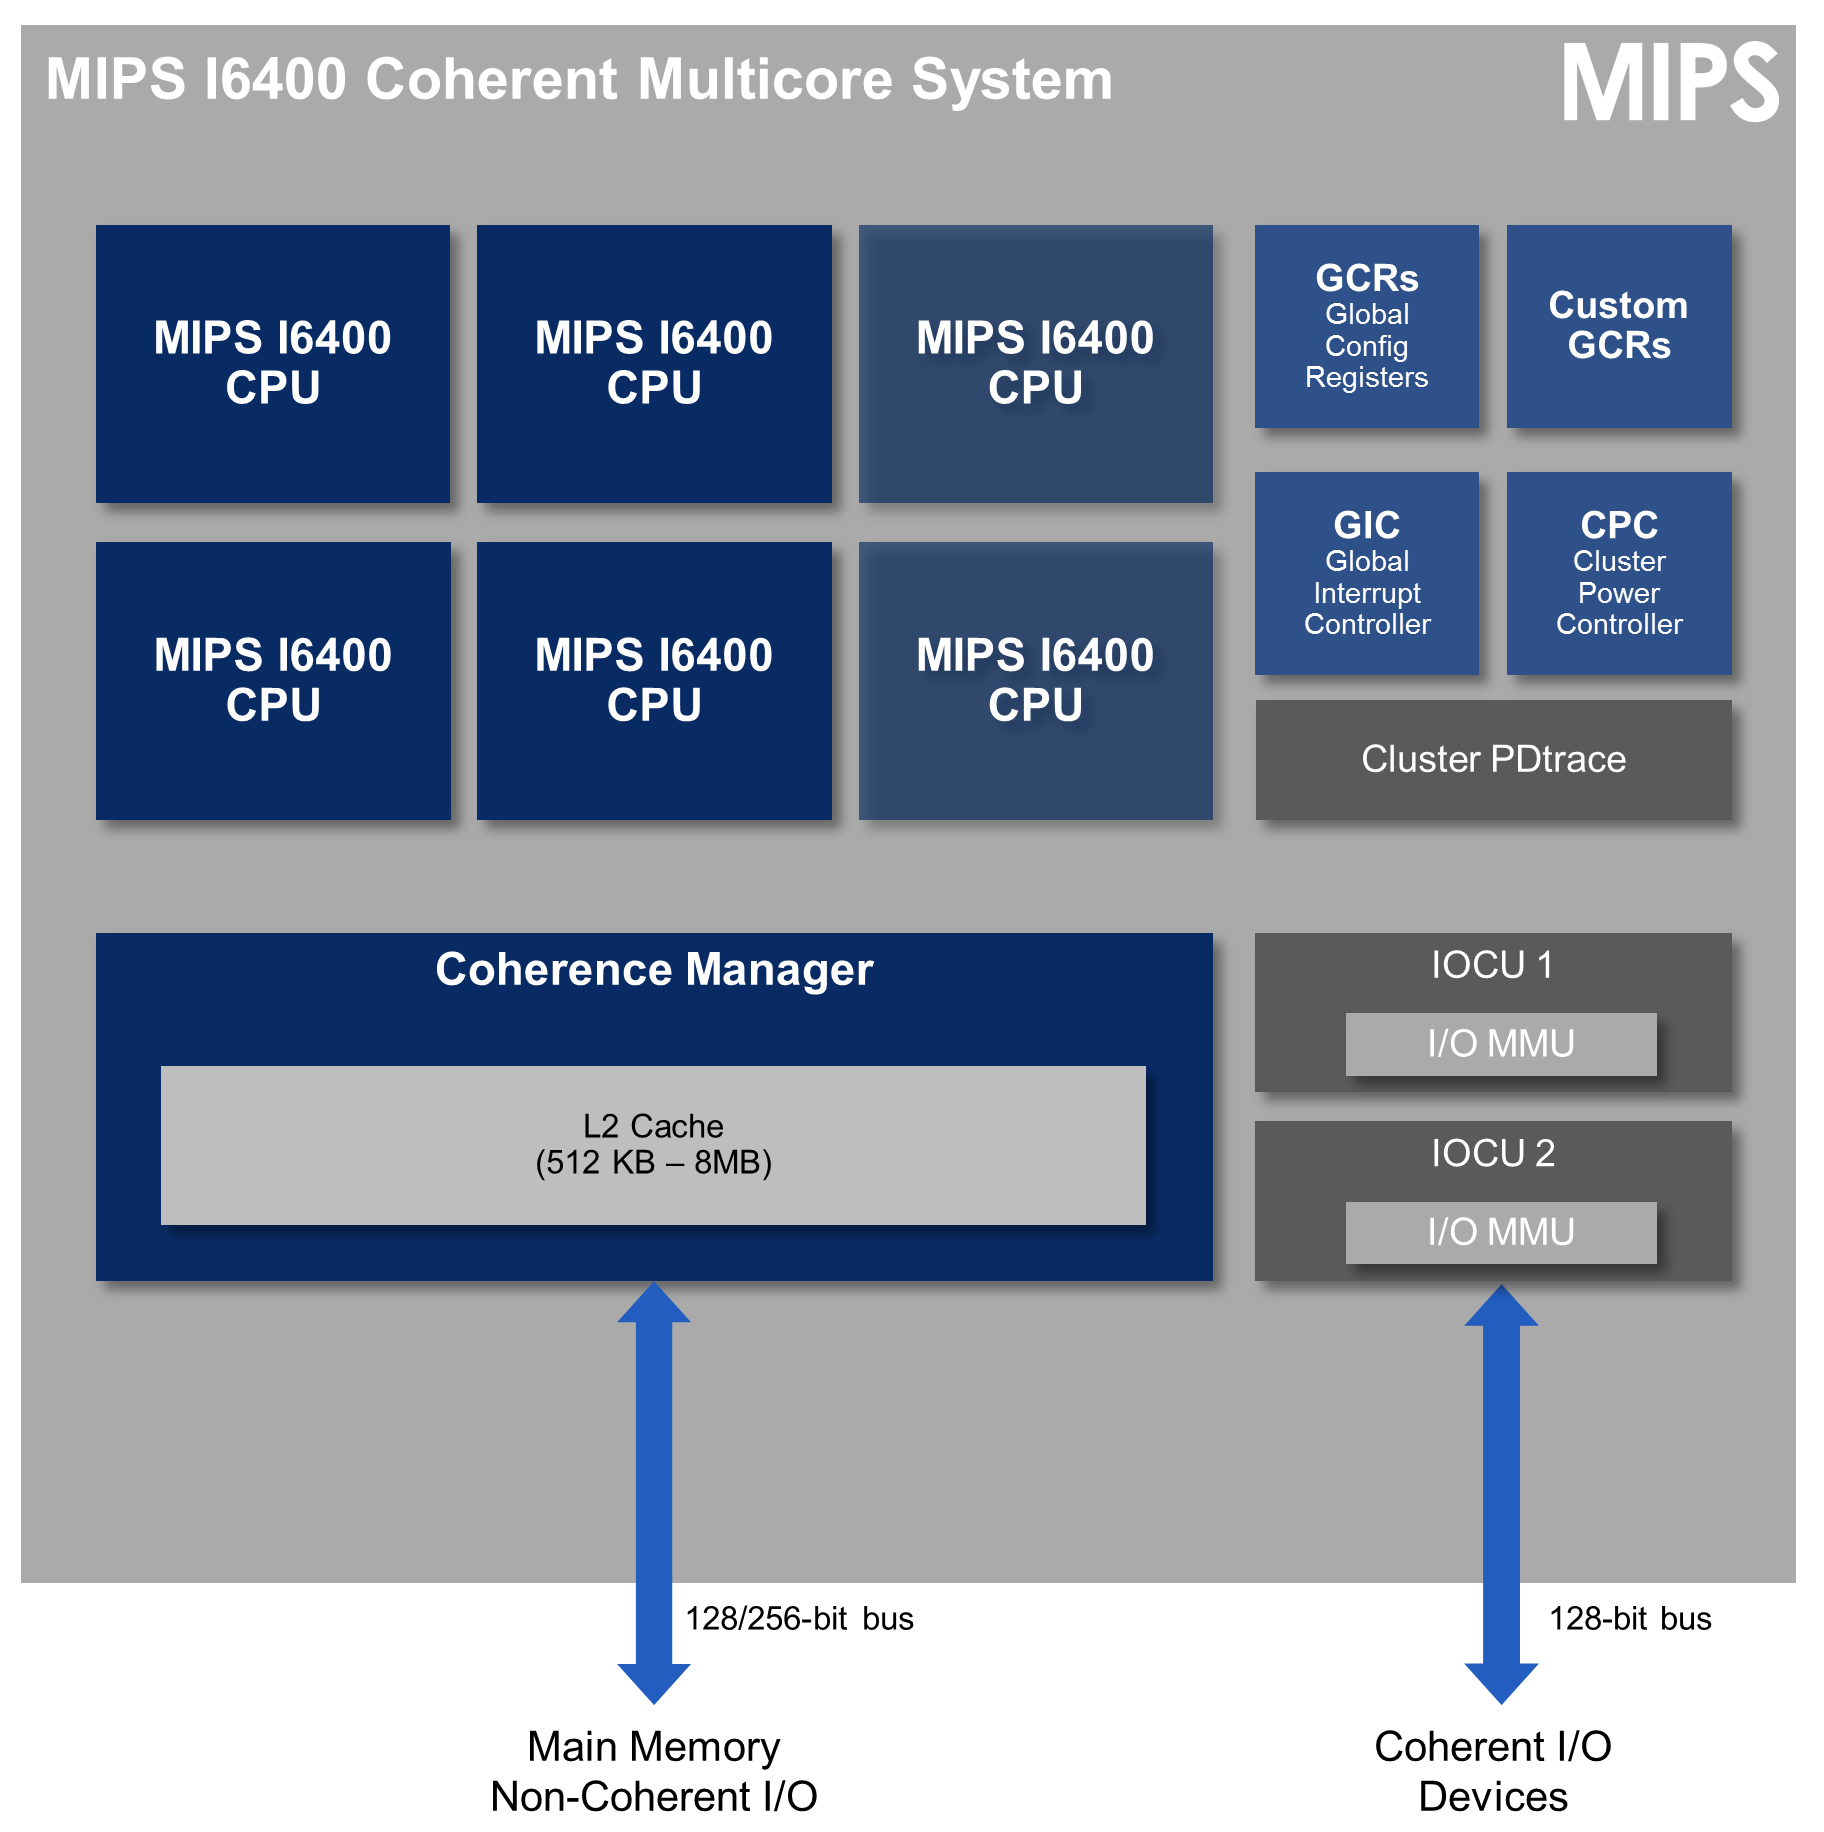 mips-i6400-cluster-F